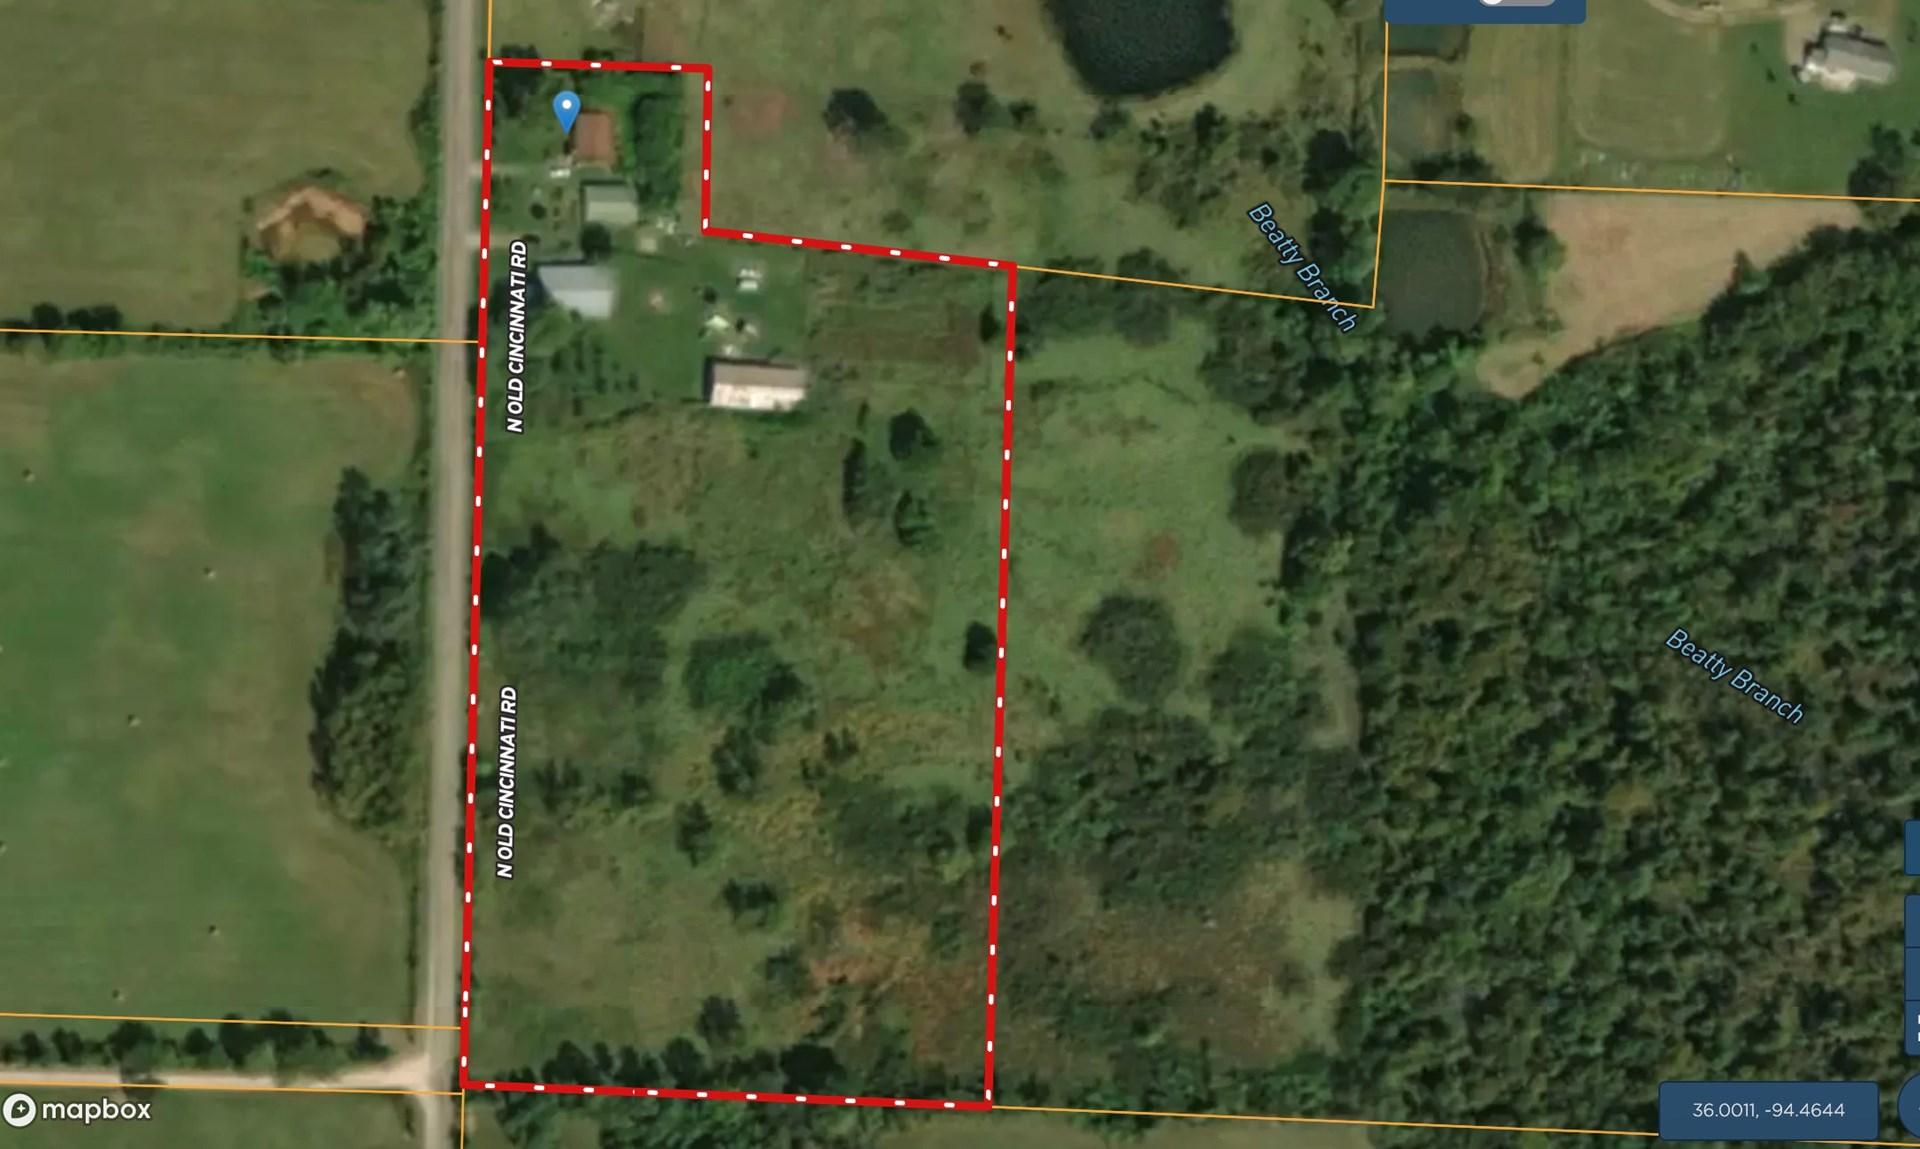 9 Acre Hobby Farm For Sale in Lincoln AR